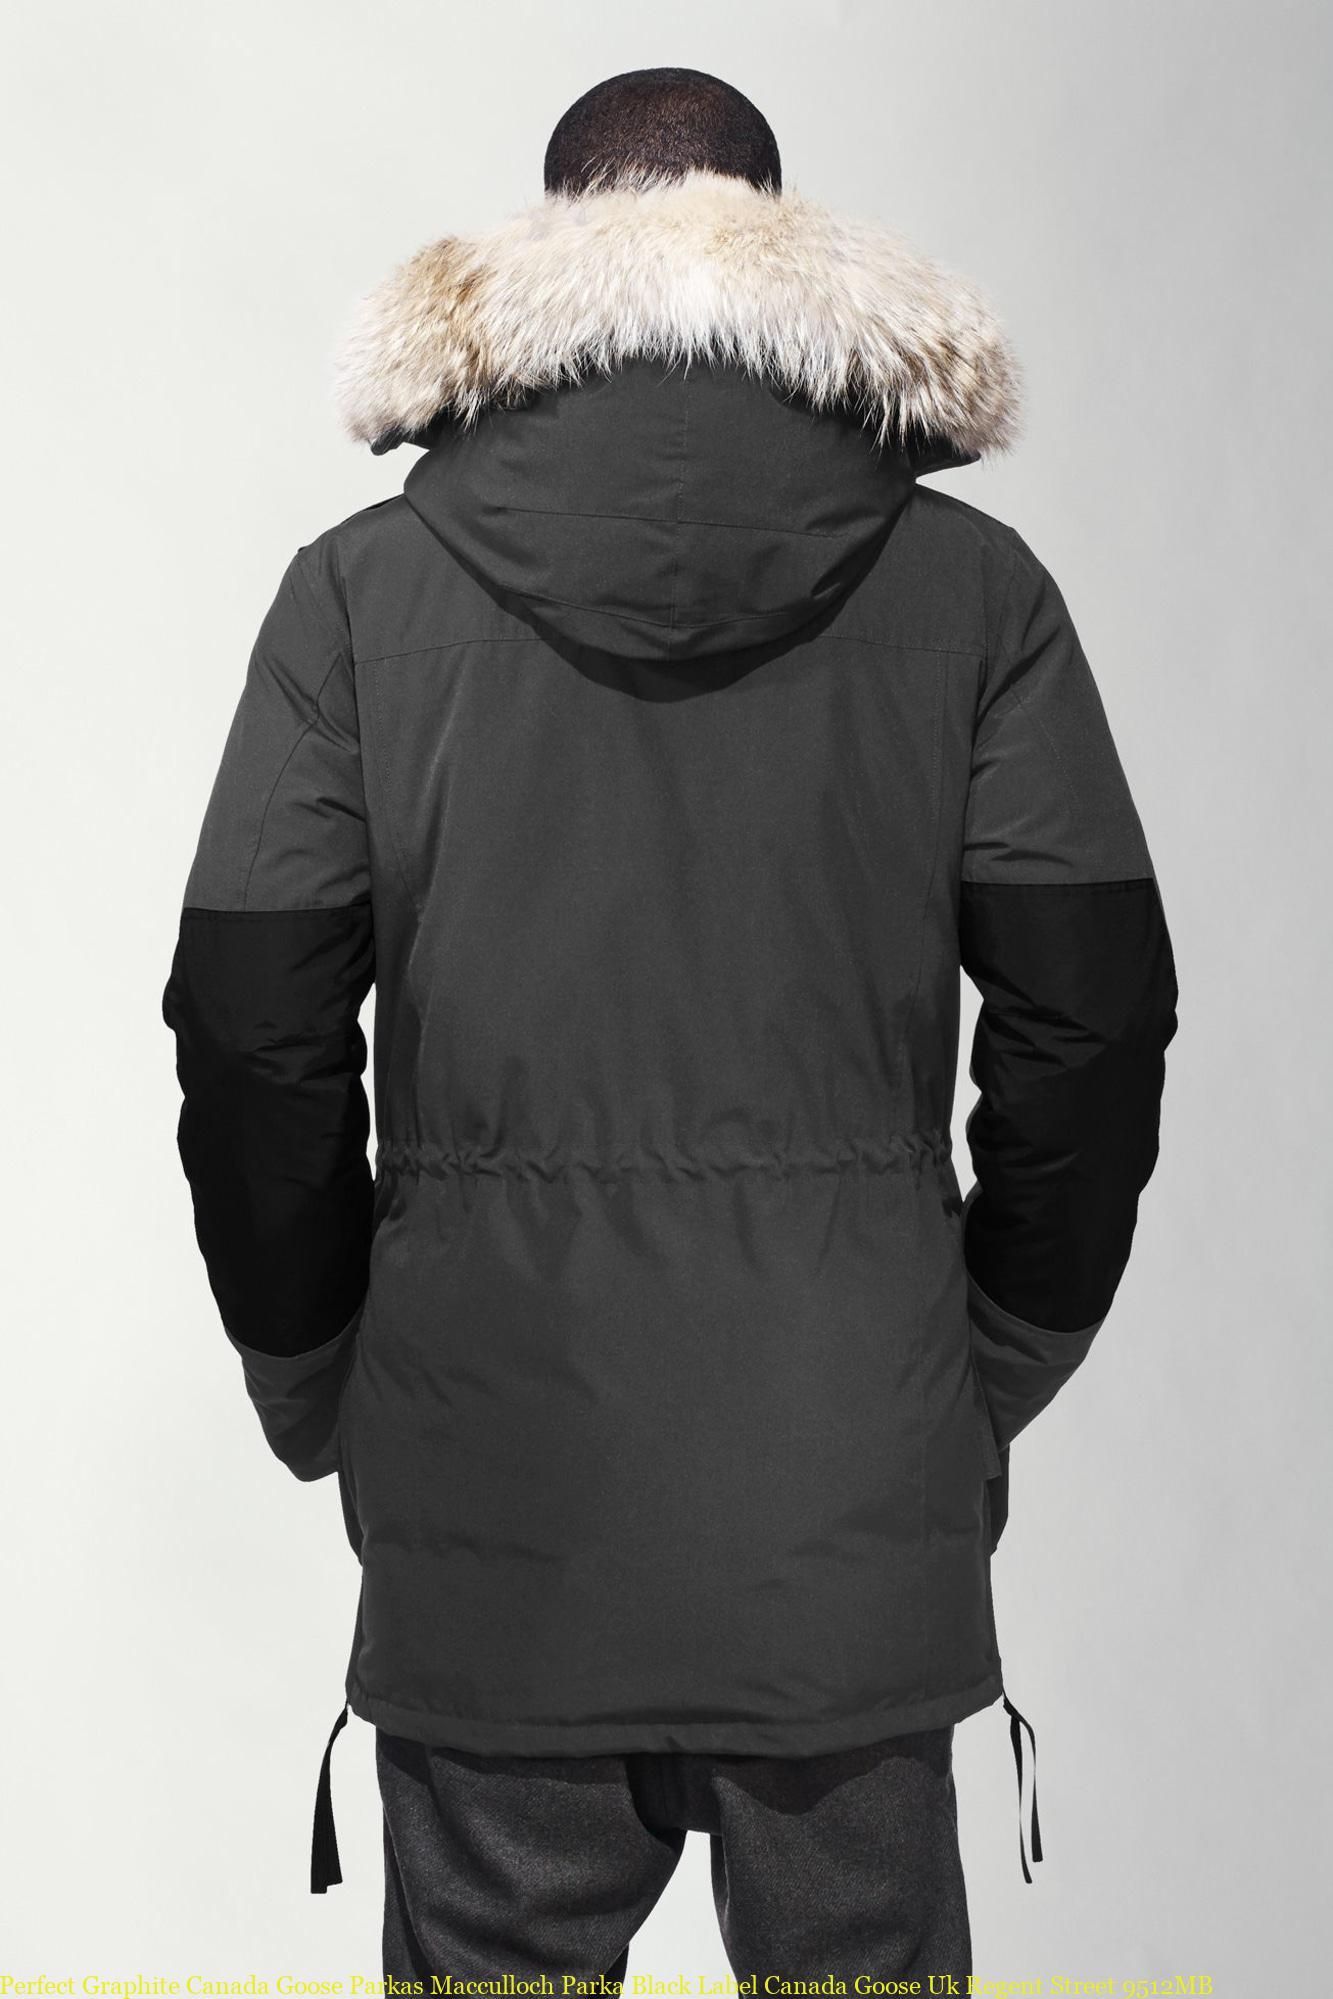 2c7161c29 Perfect Graphite Canada Goose Parkas Macculloch Parka Black Label Canada  Goose Uk Regent Street 9512MB